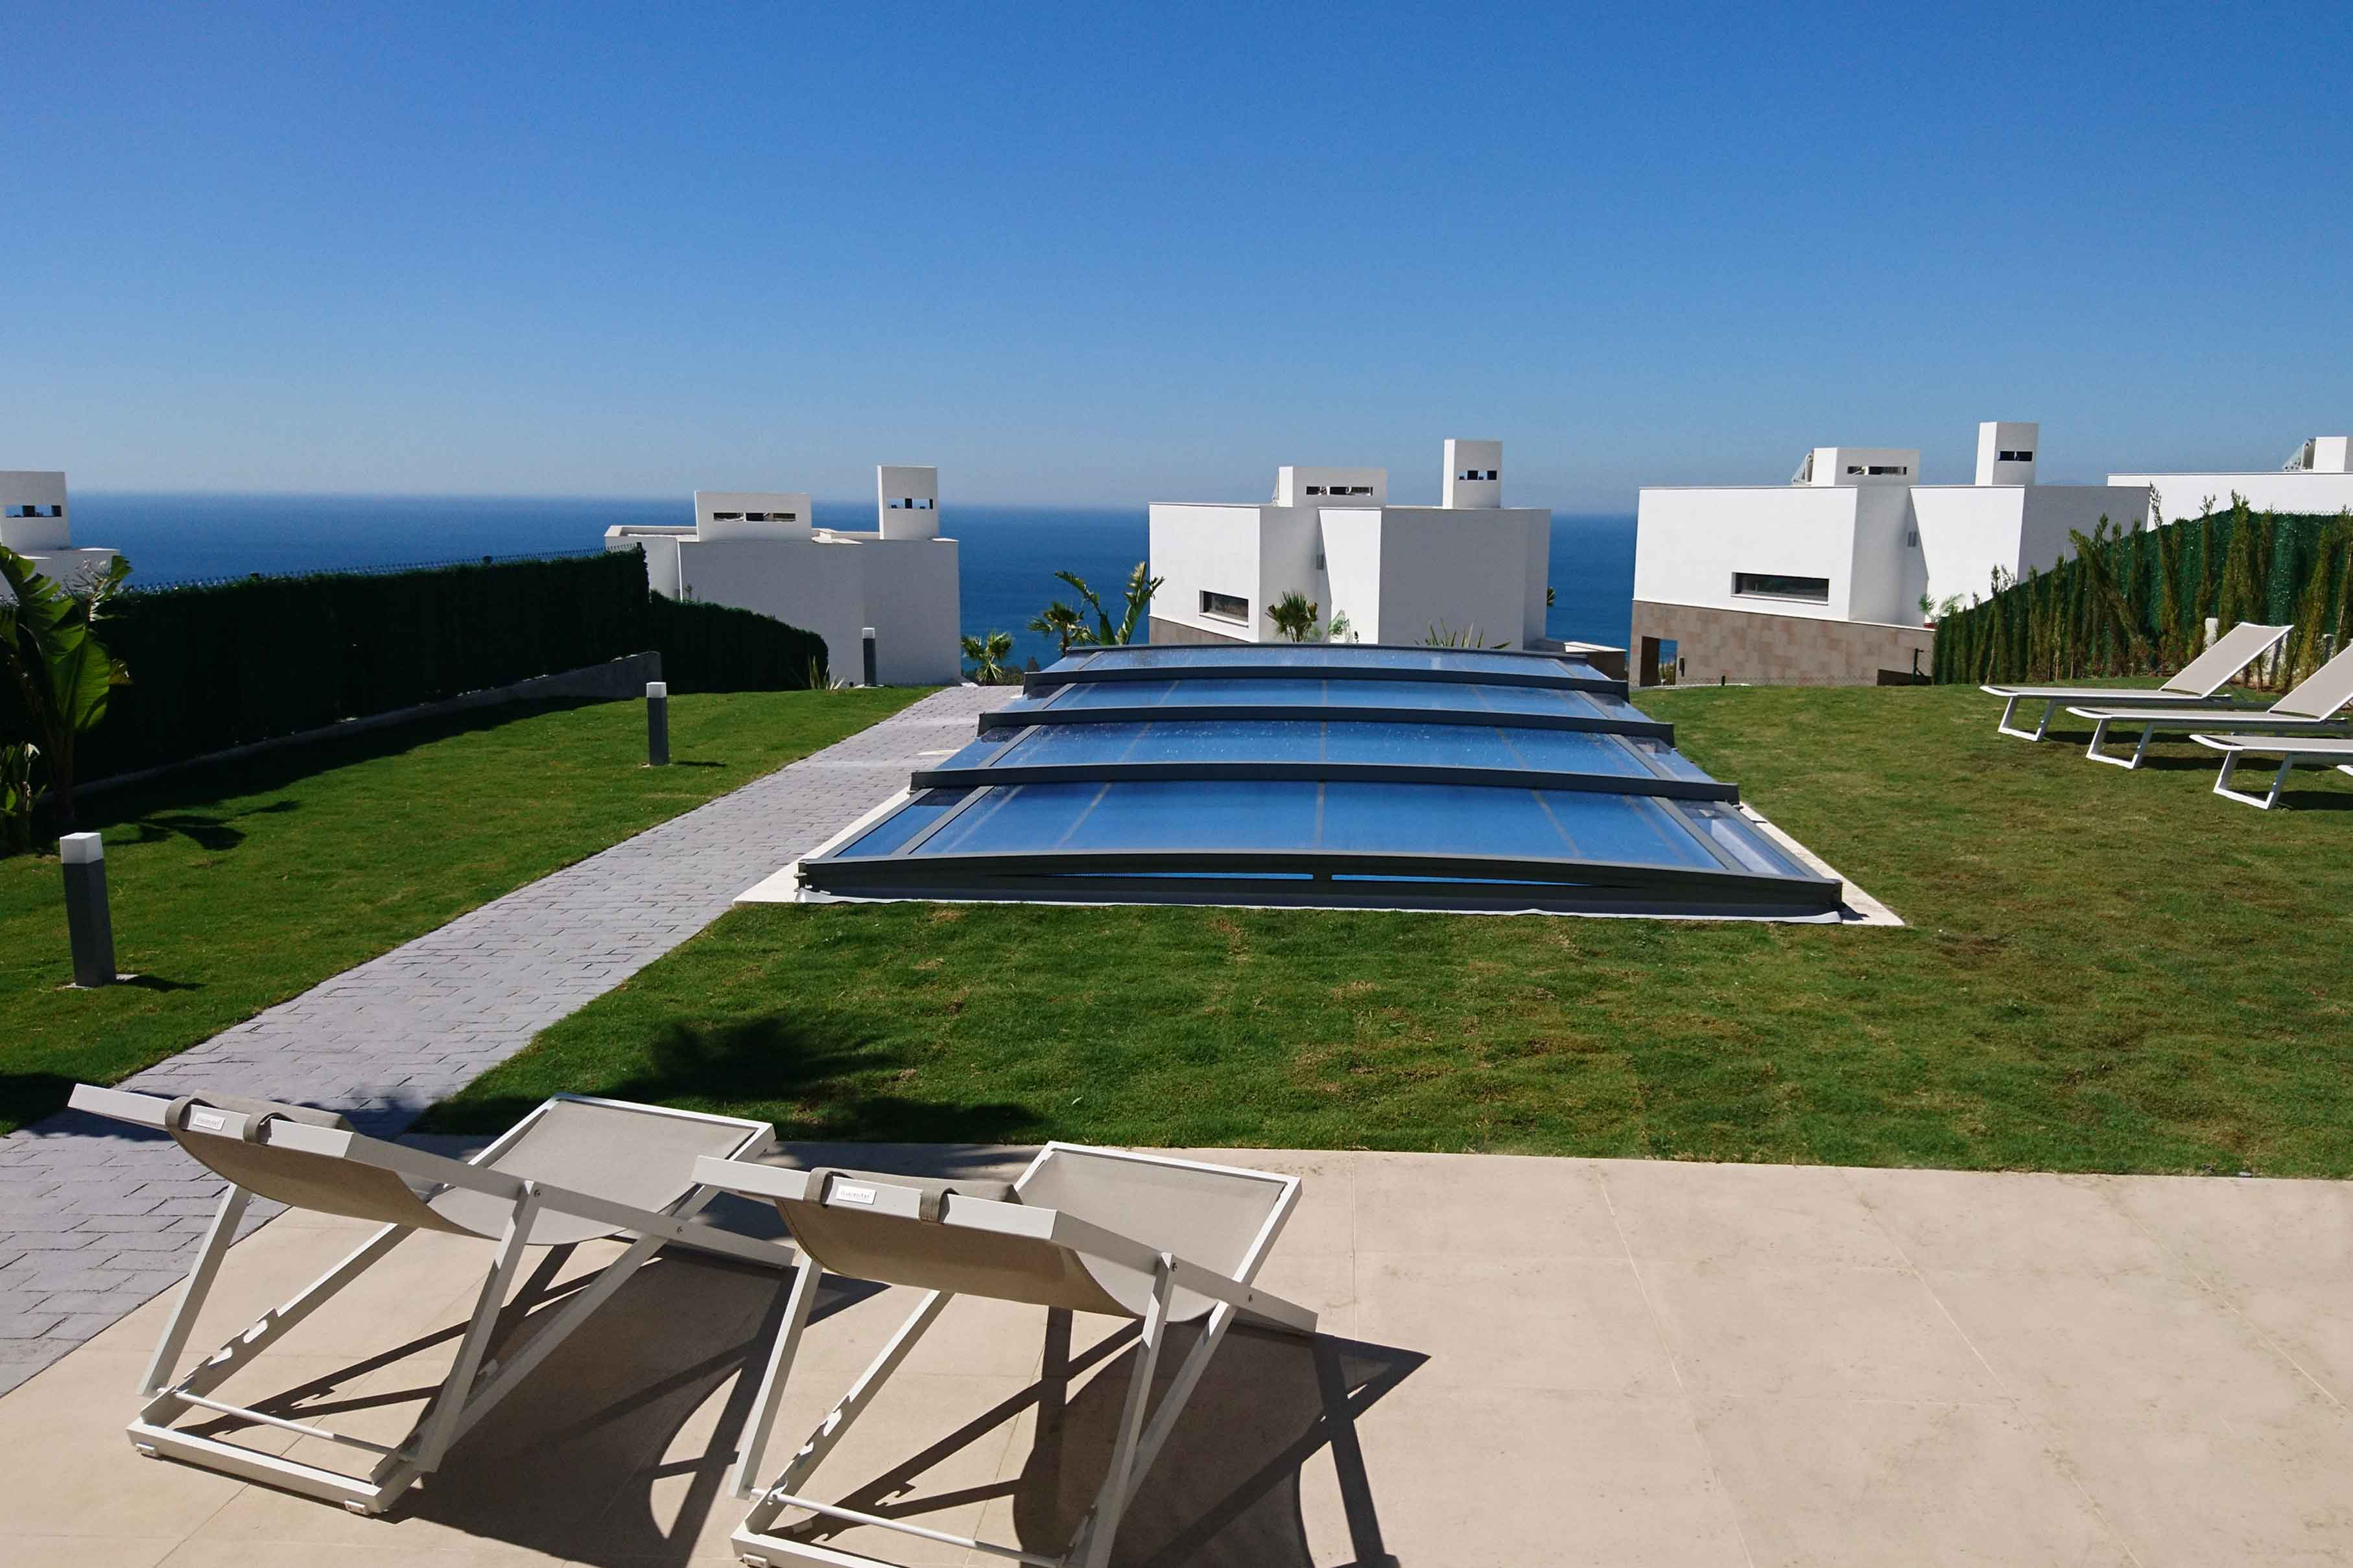 cubierta para piscina telescopica ultra baja Azenco